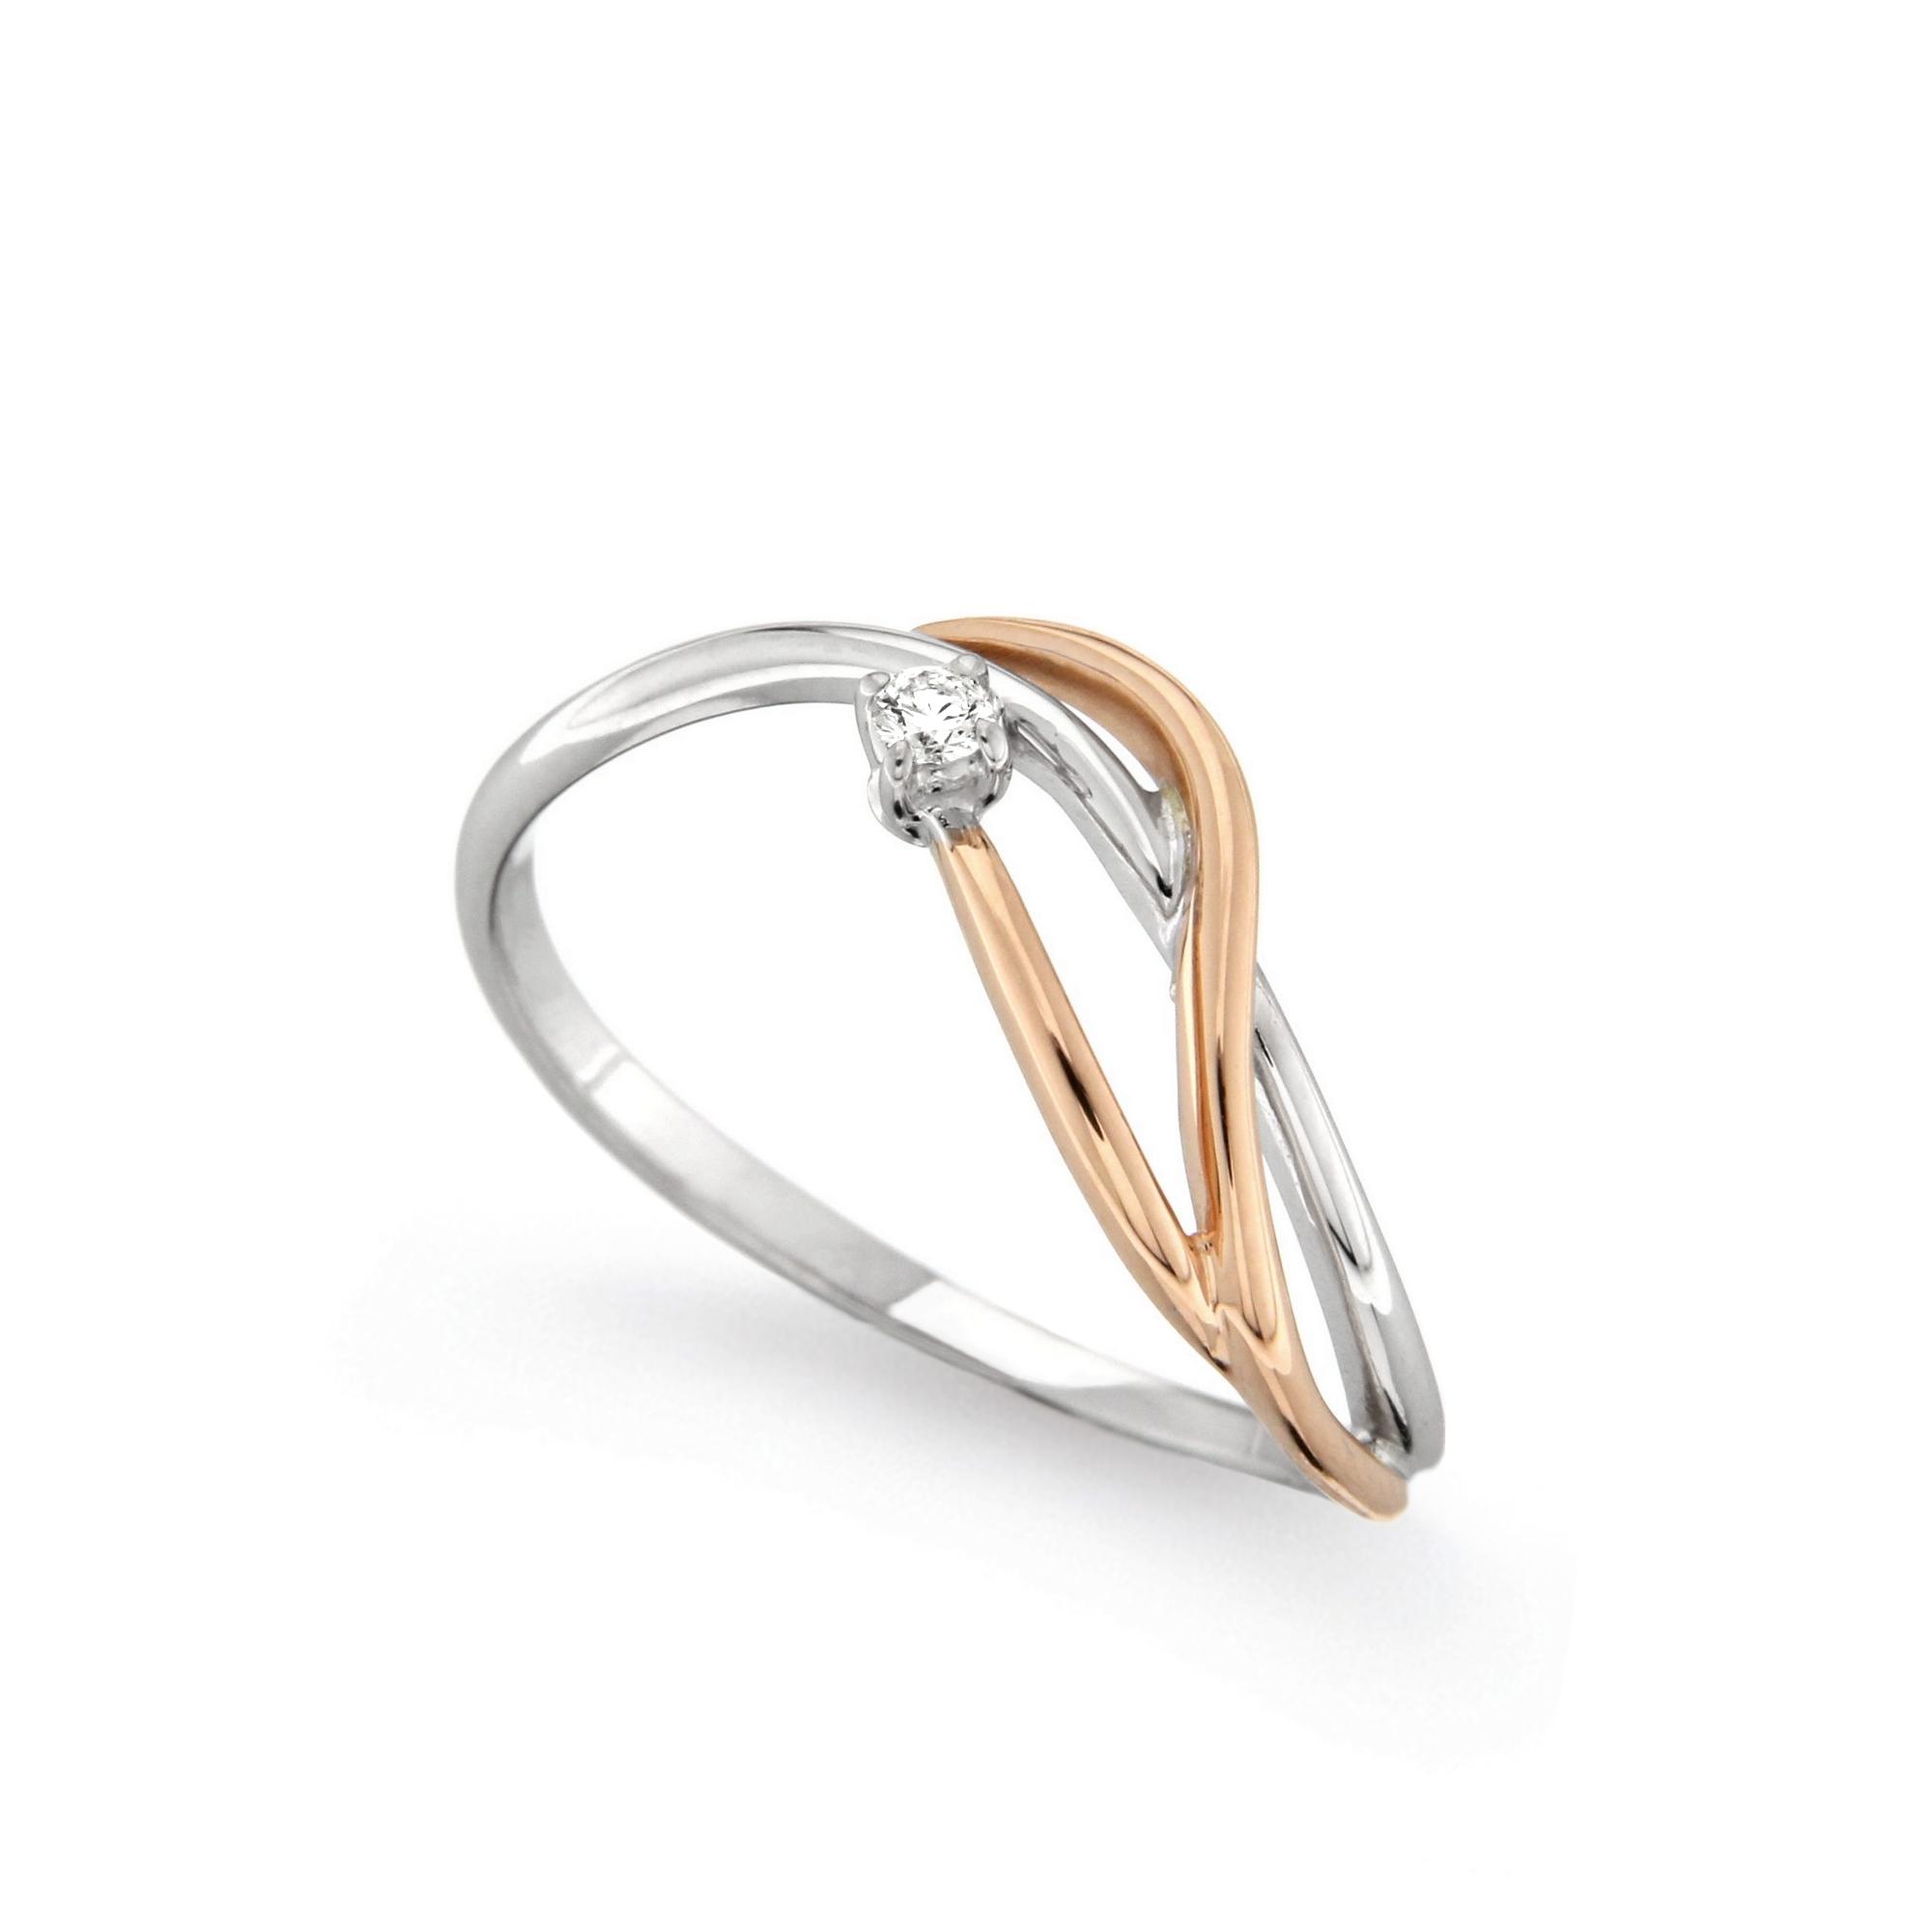 Inel de logodna din aur 18K cu diamant 0,03 ct., model Orsini 2444G